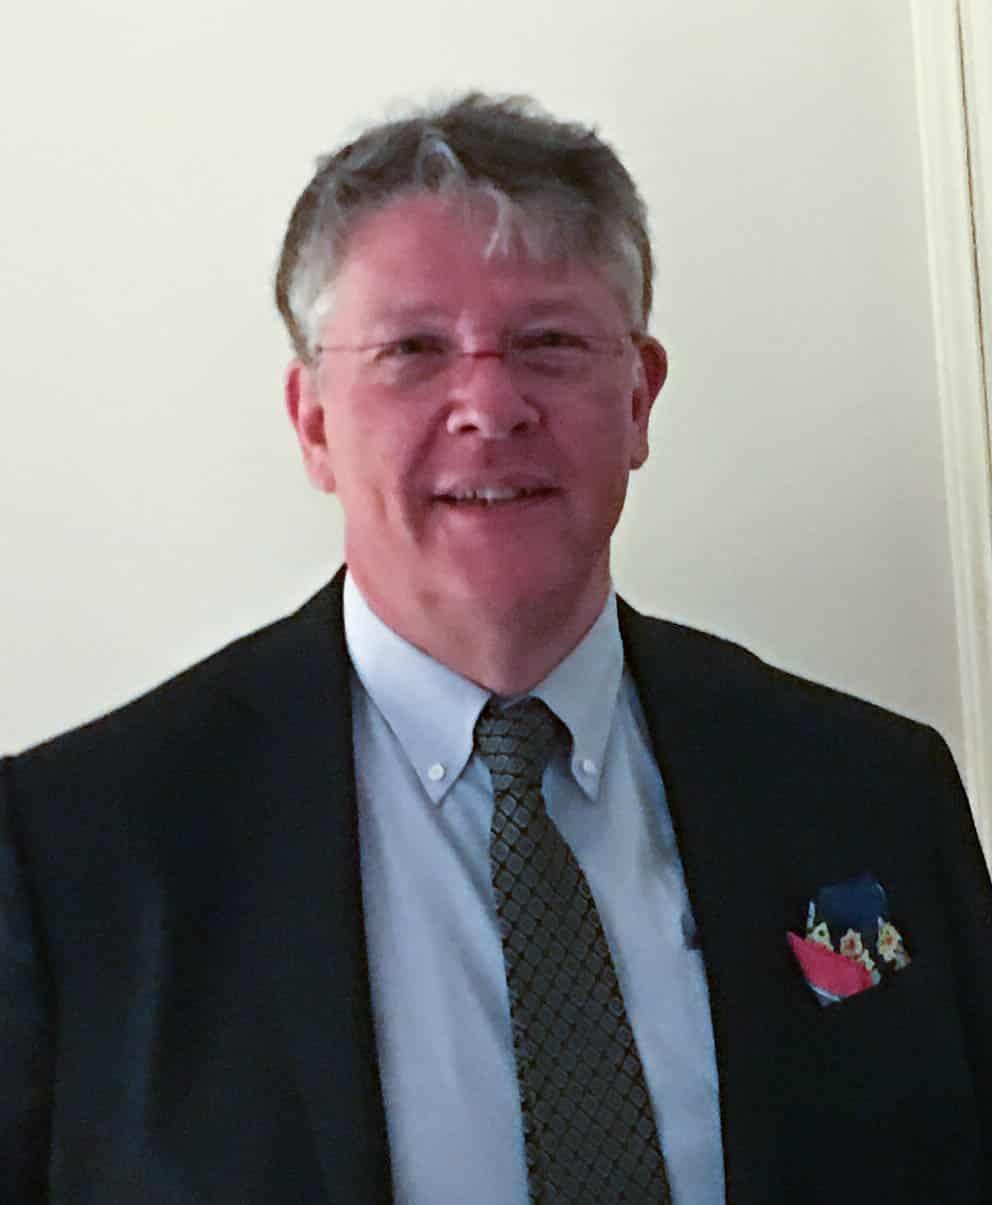 Lebenslauf - Praxis Dr. Philipp Weiss